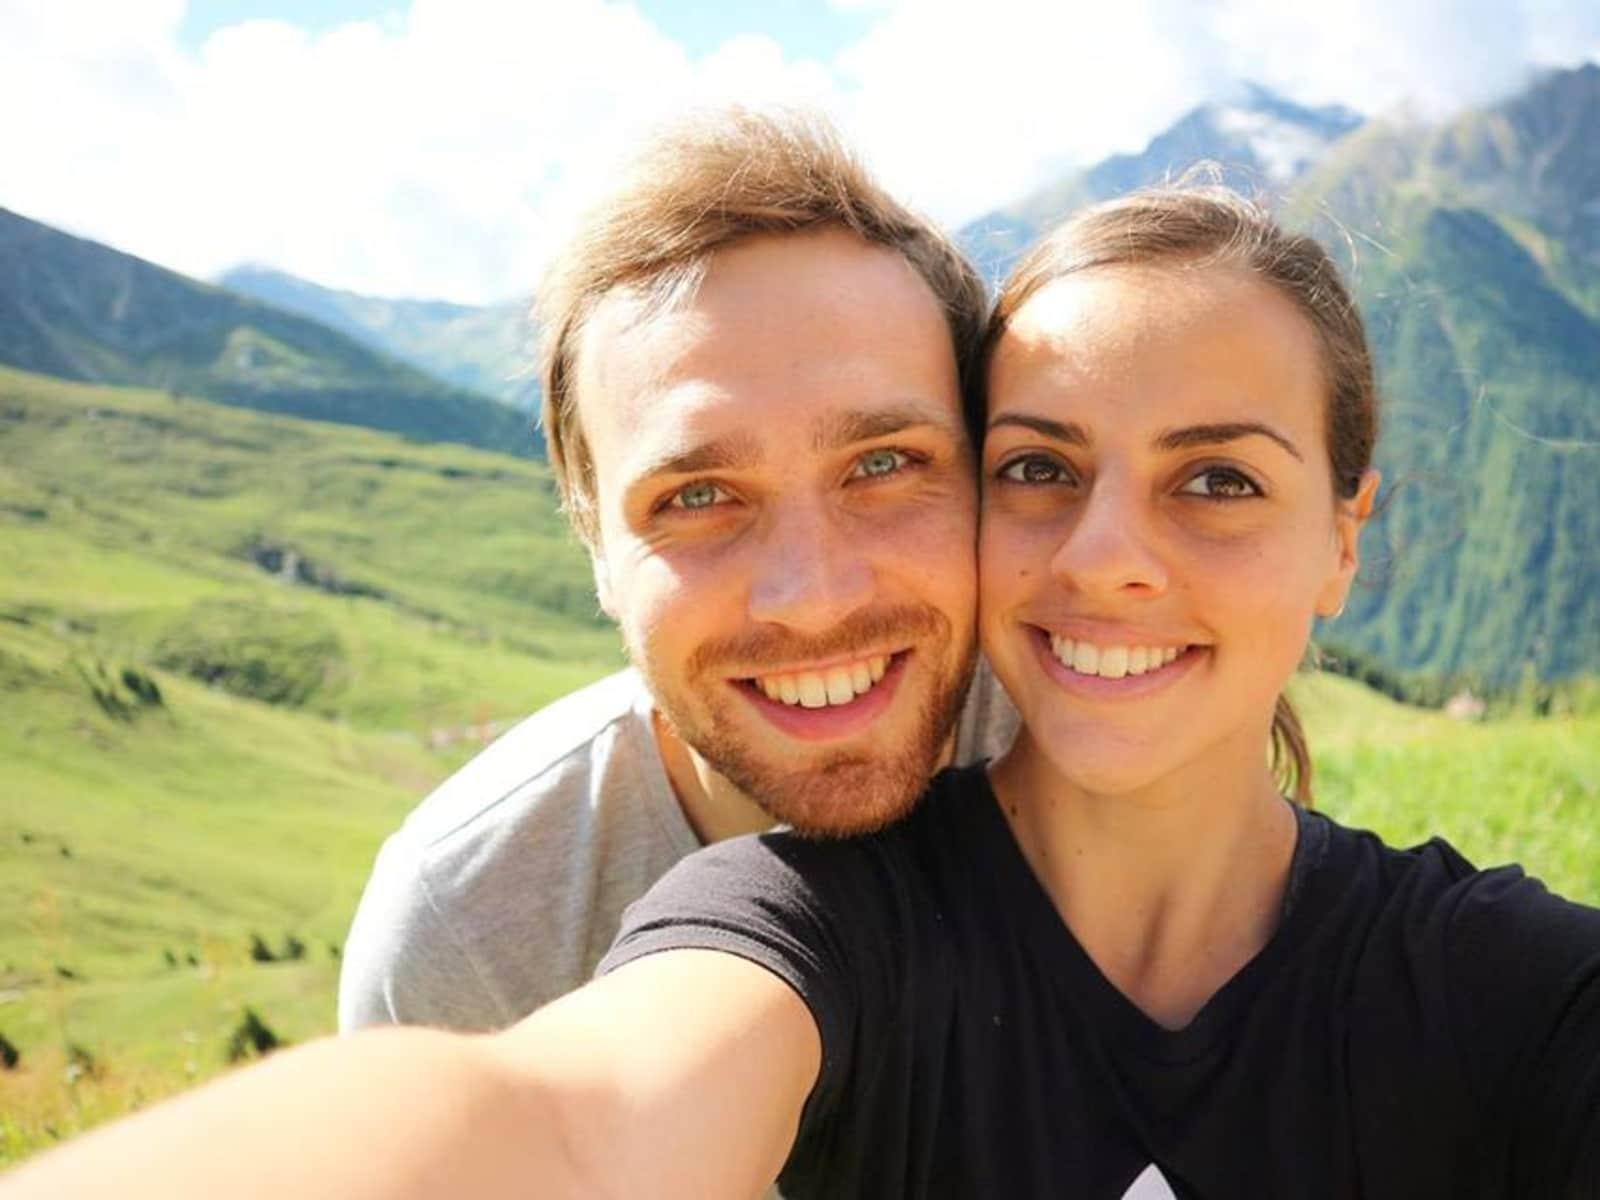 Jessica & Fabian from Vancouver, British Columbia, Canada